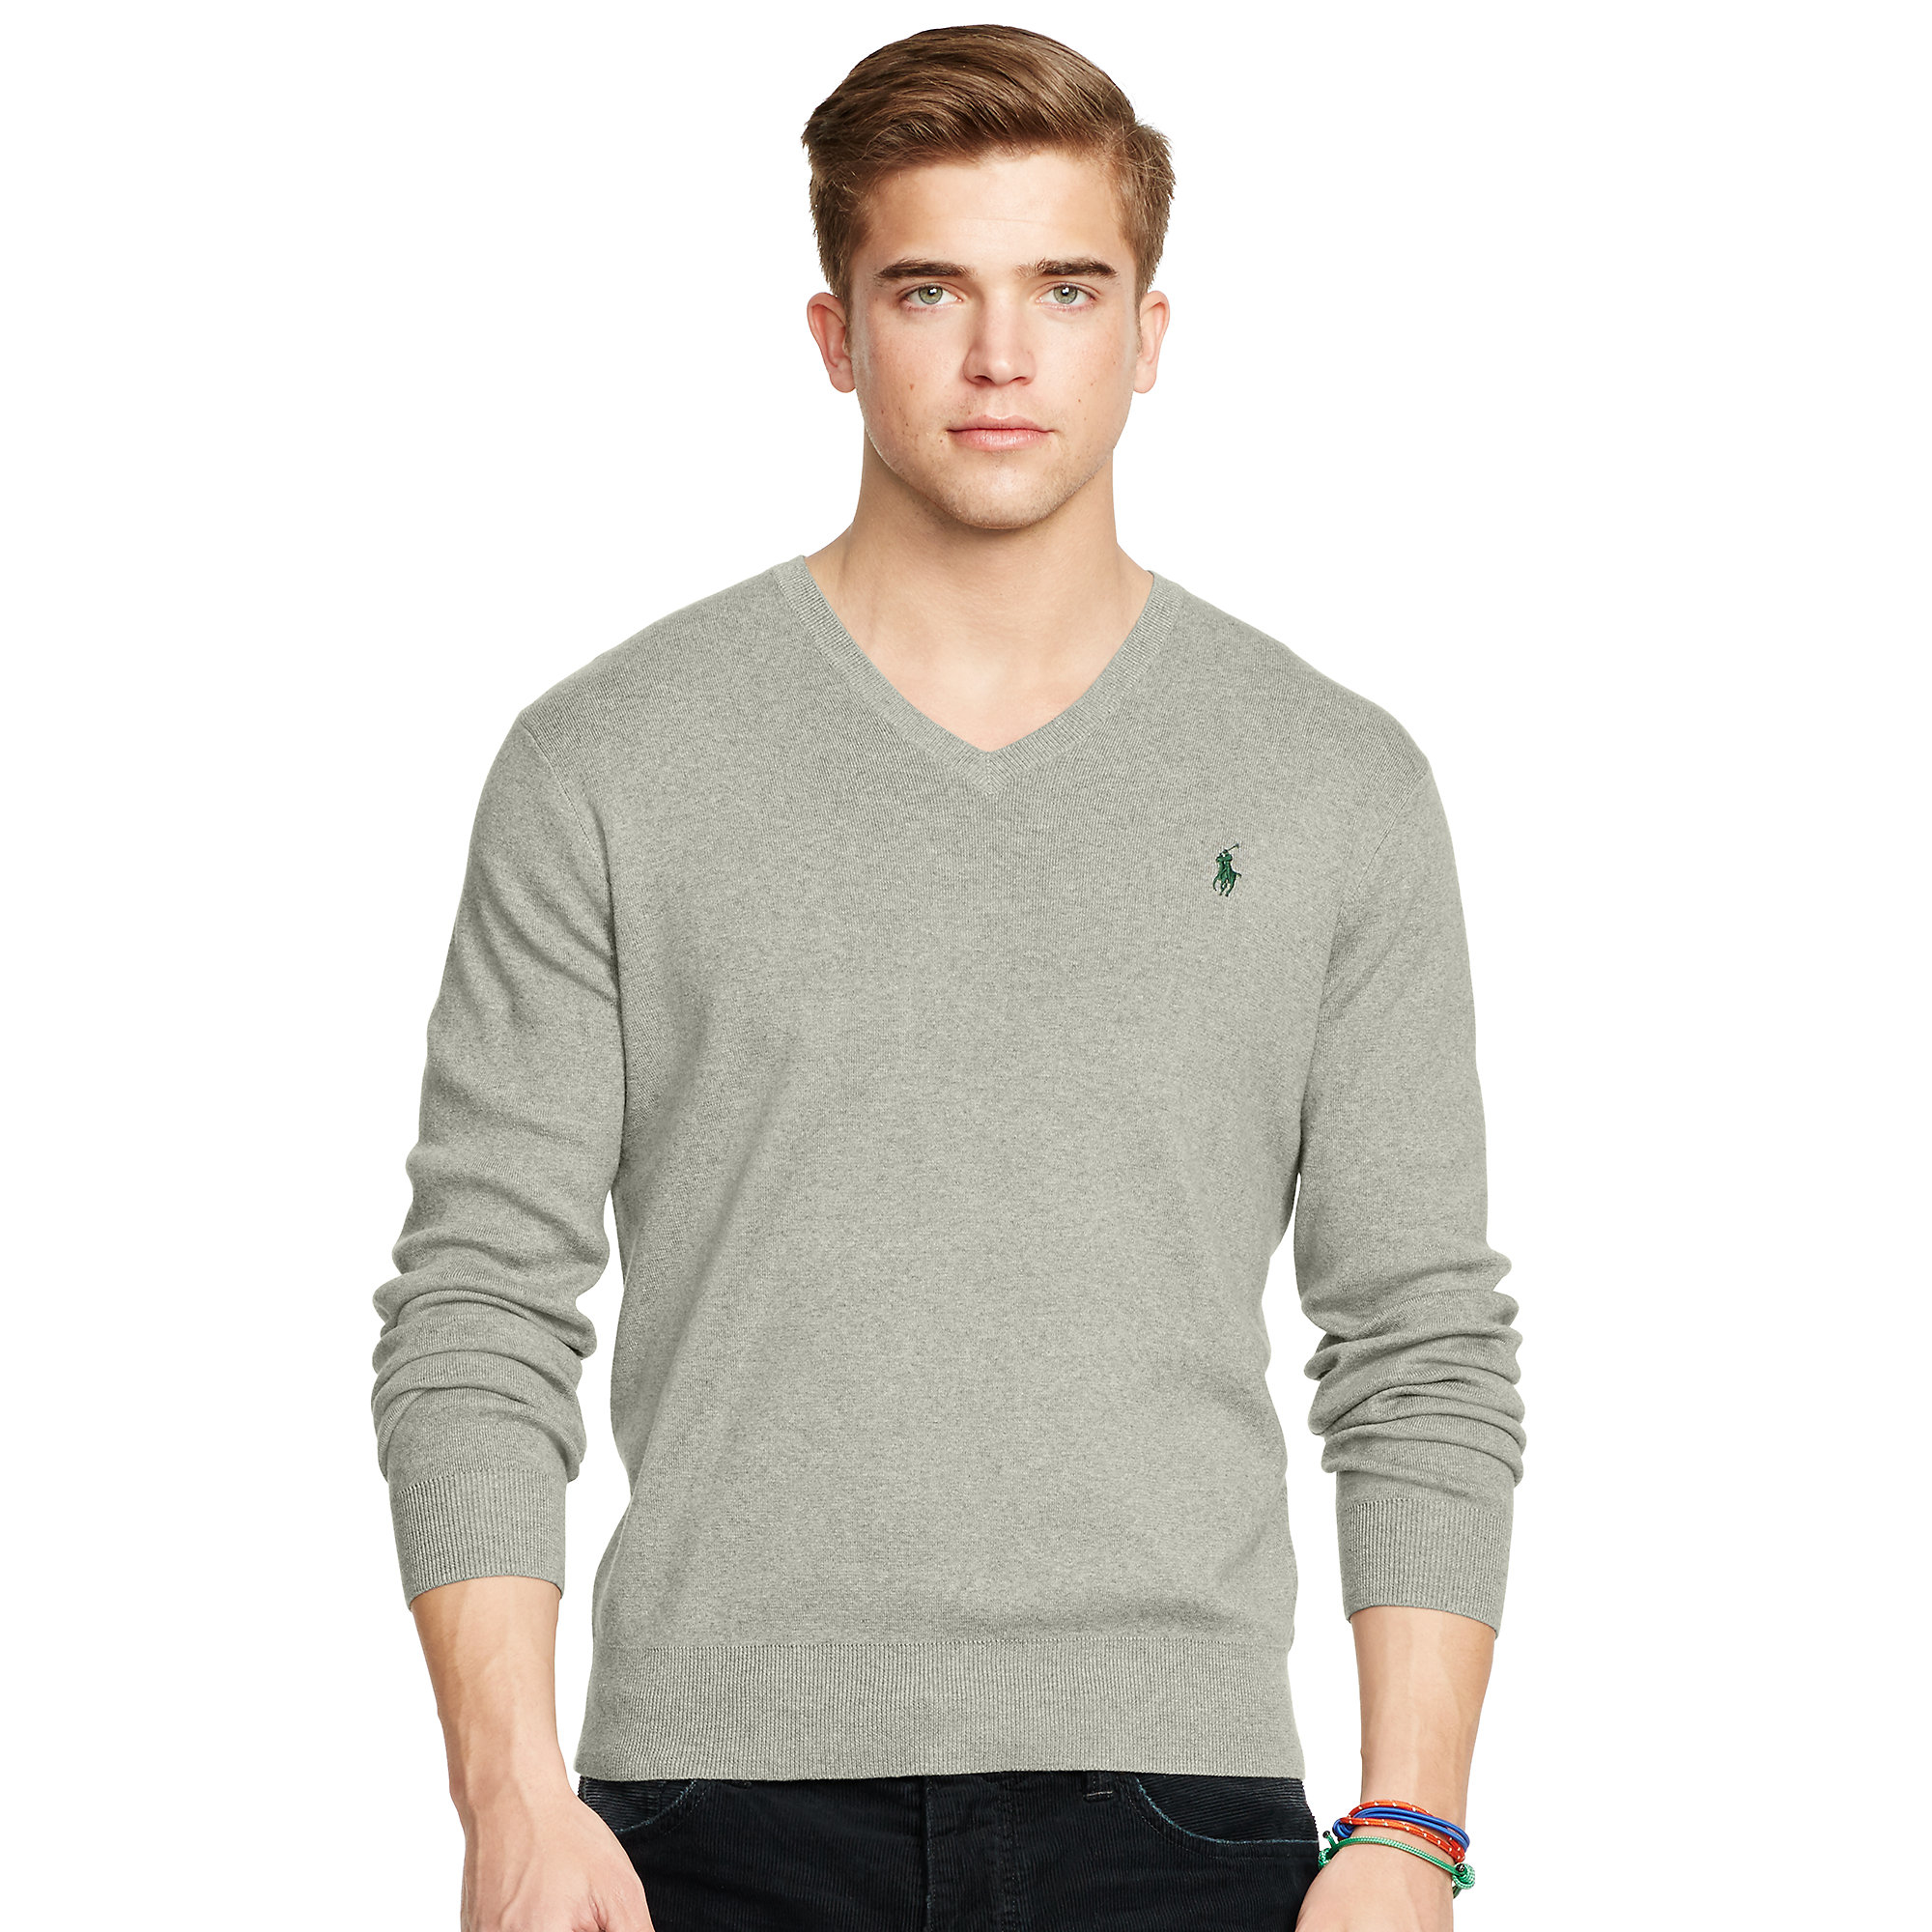 Lyst - Polo Ralph Lauren Pima Cotton V-neck Sweater in Gray for Men 16357122559f